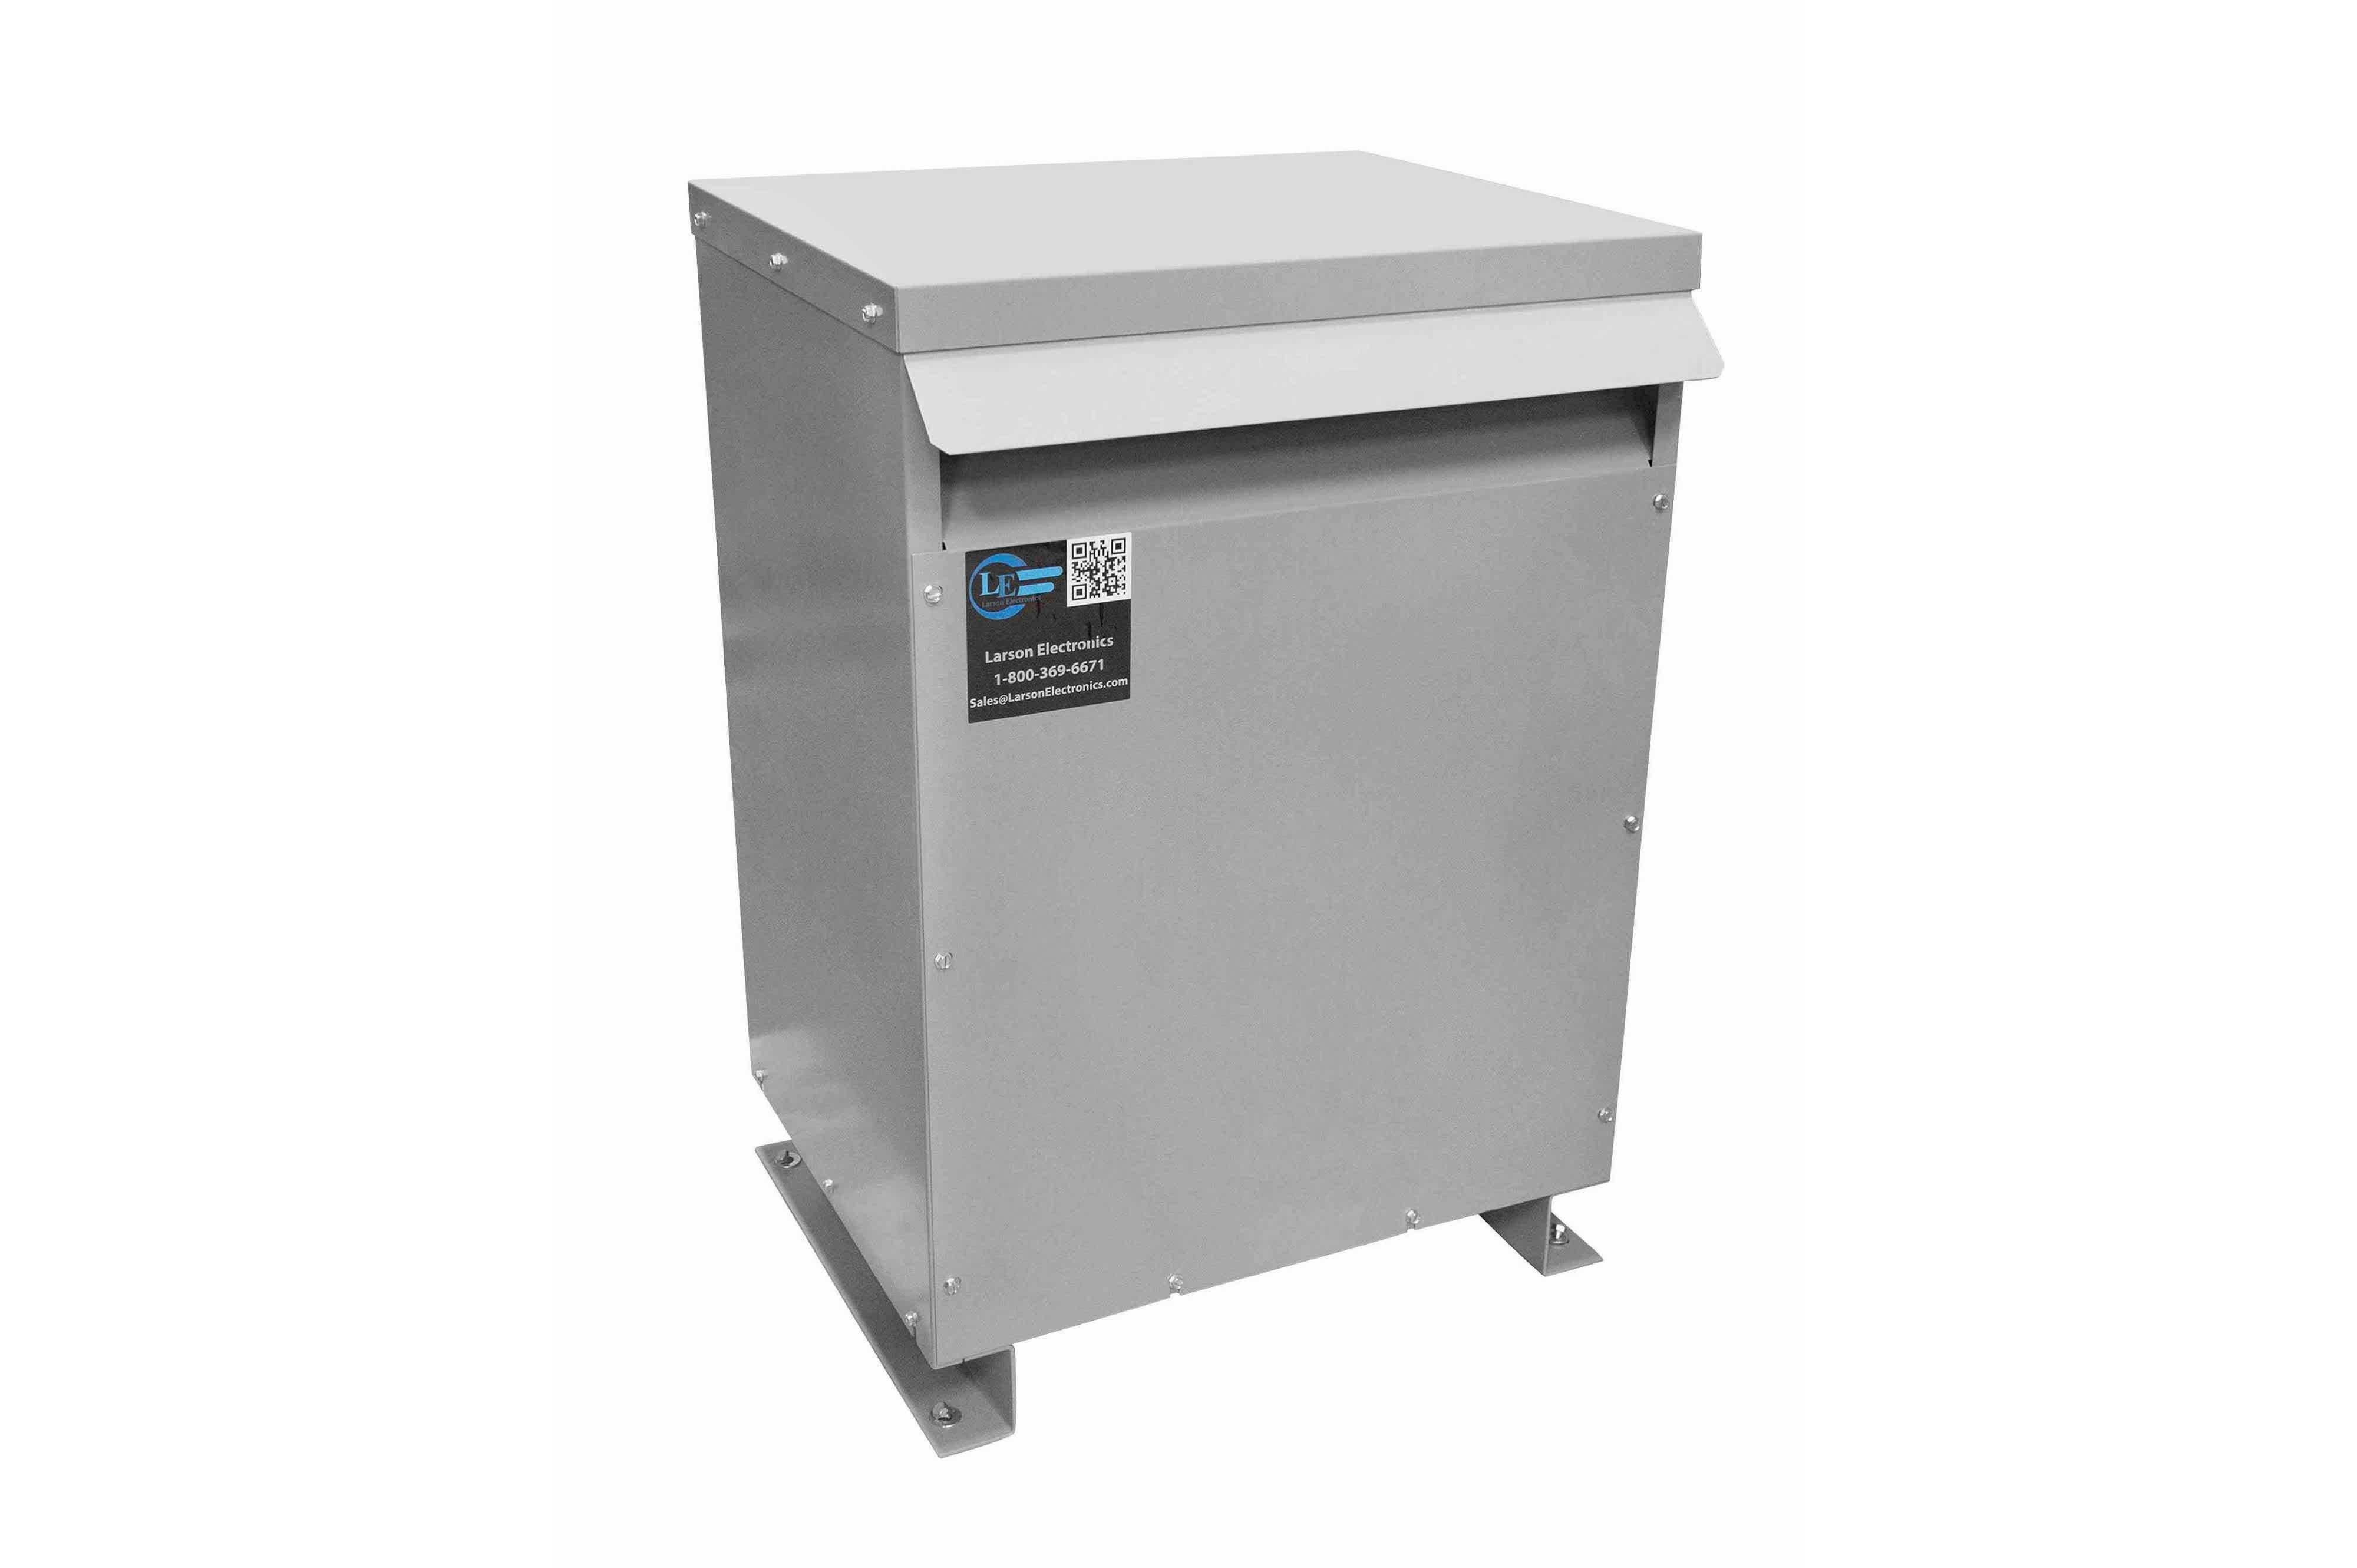 70 kVA 3PH Isolation Transformer, 400V Wye Primary, 240V Delta Secondary, N3R, Ventilated, 60 Hz